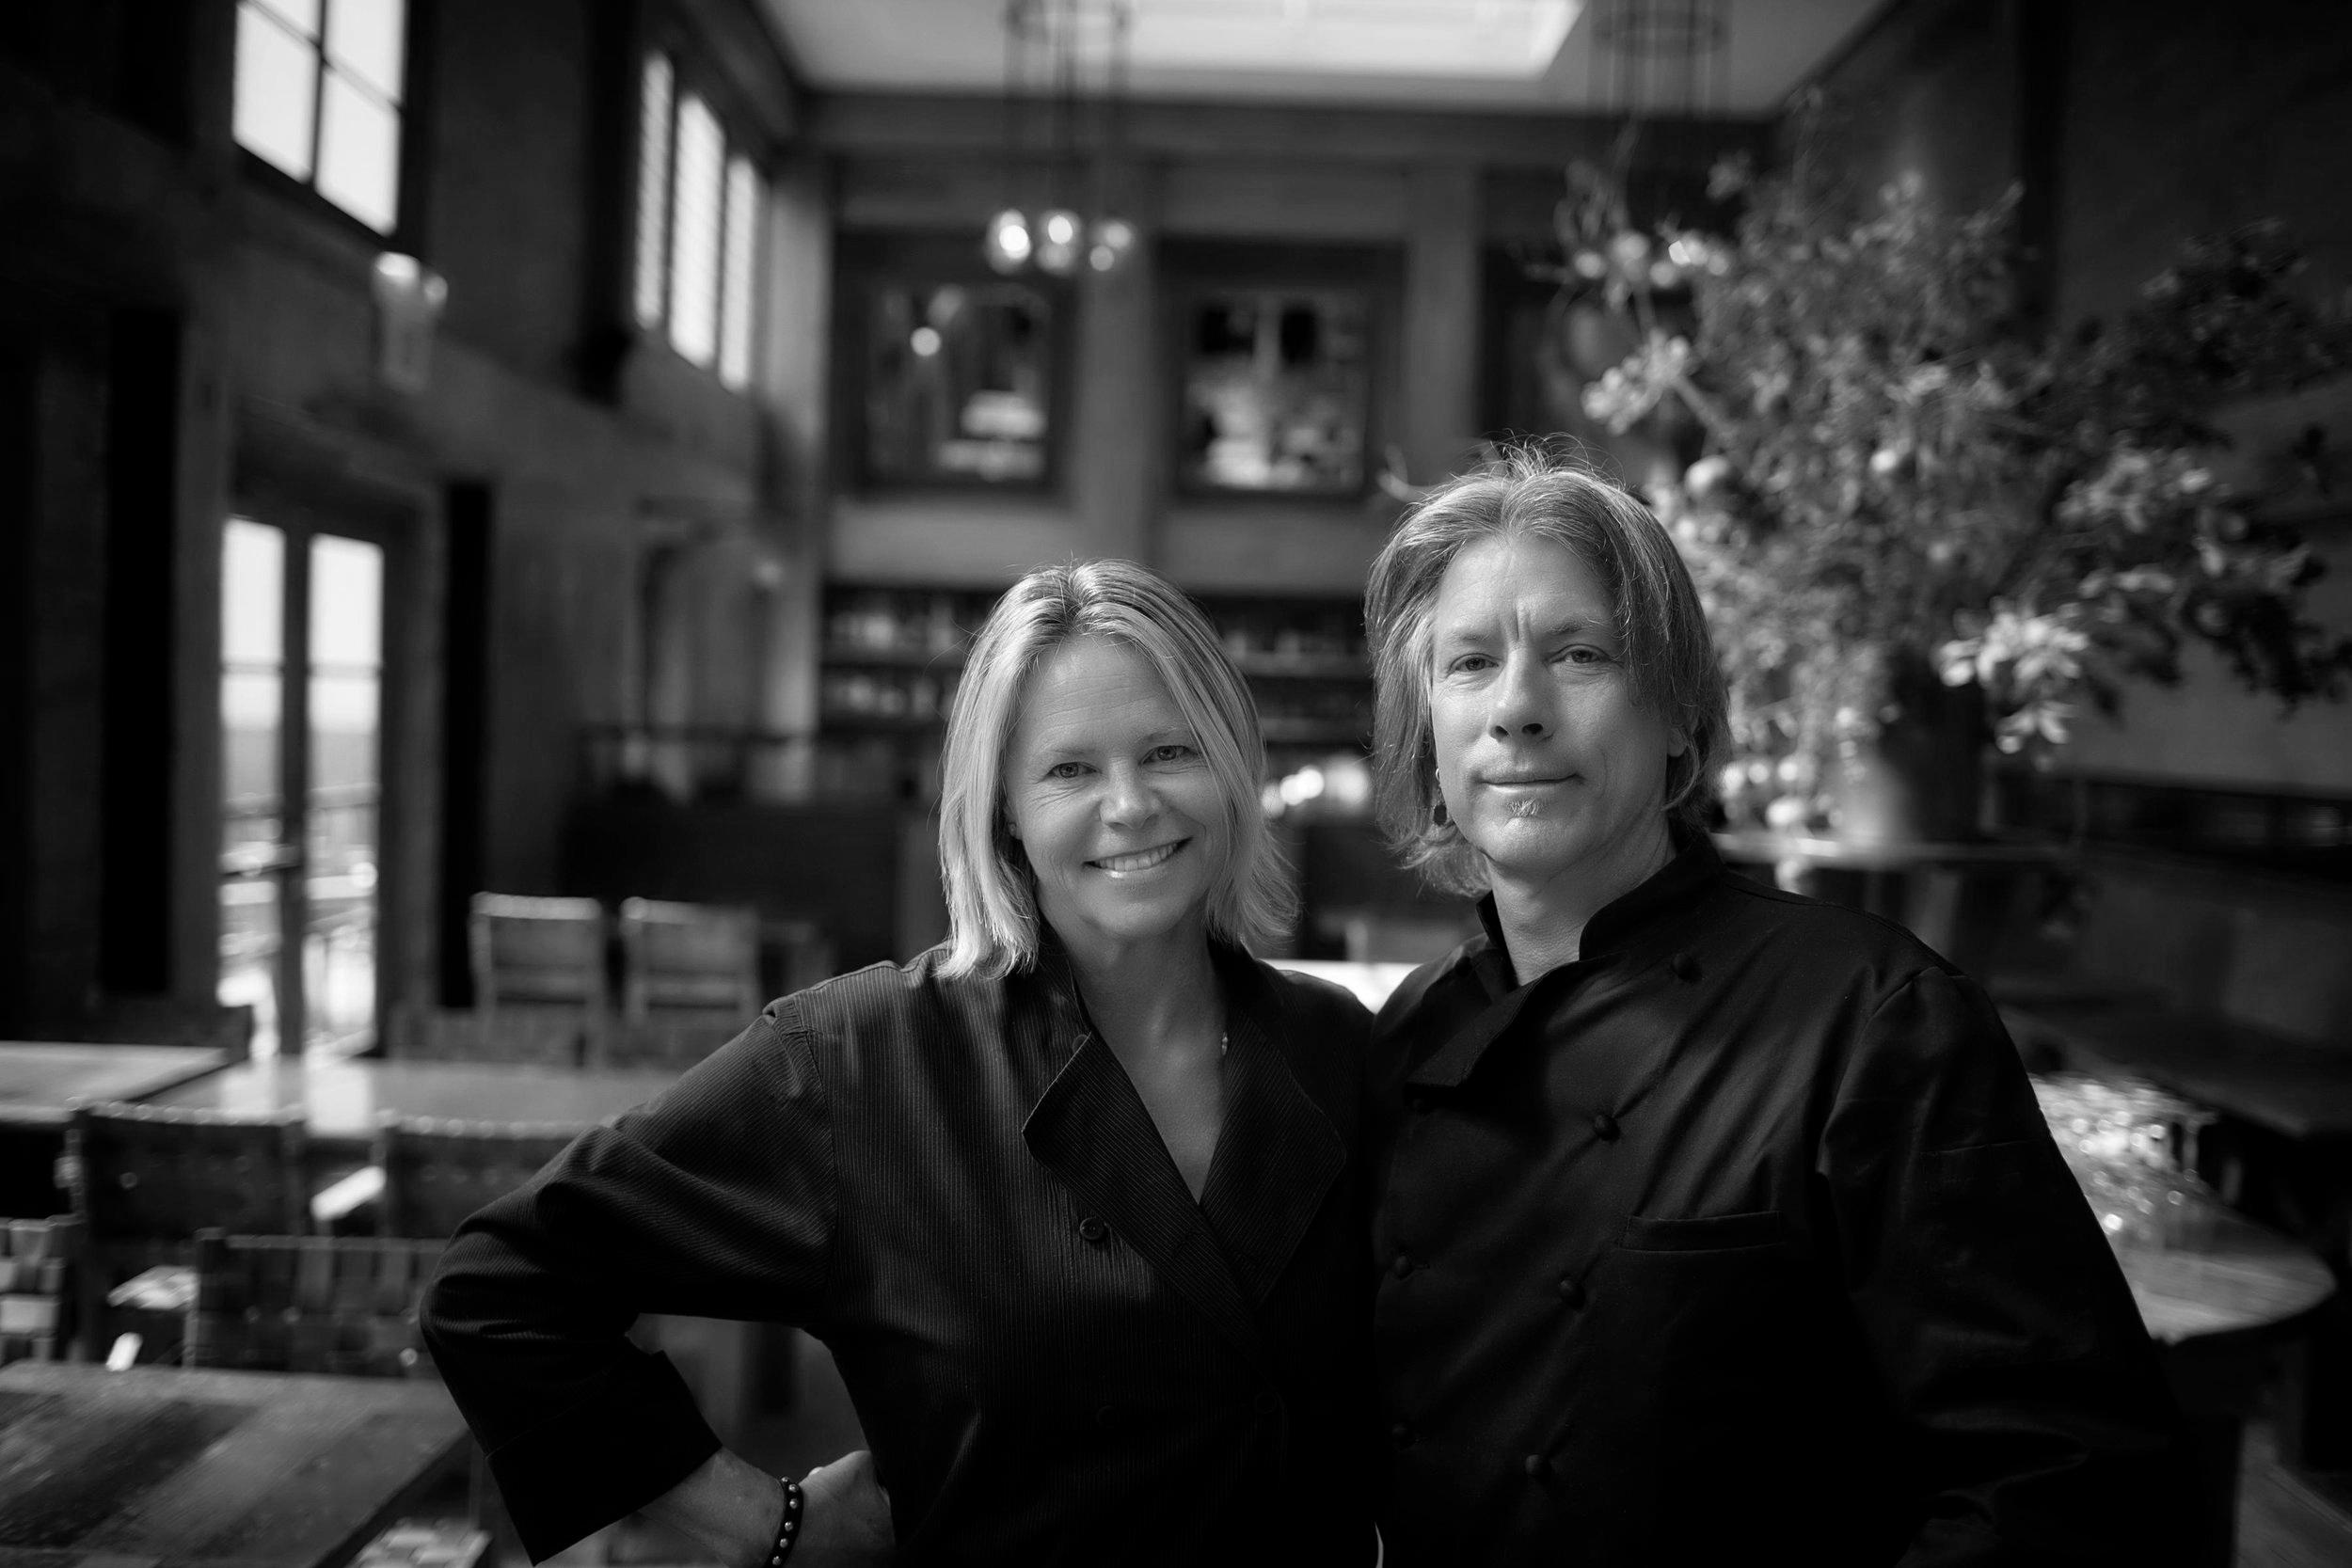 Gayle Pirie and John Clark of Foreign Cinema